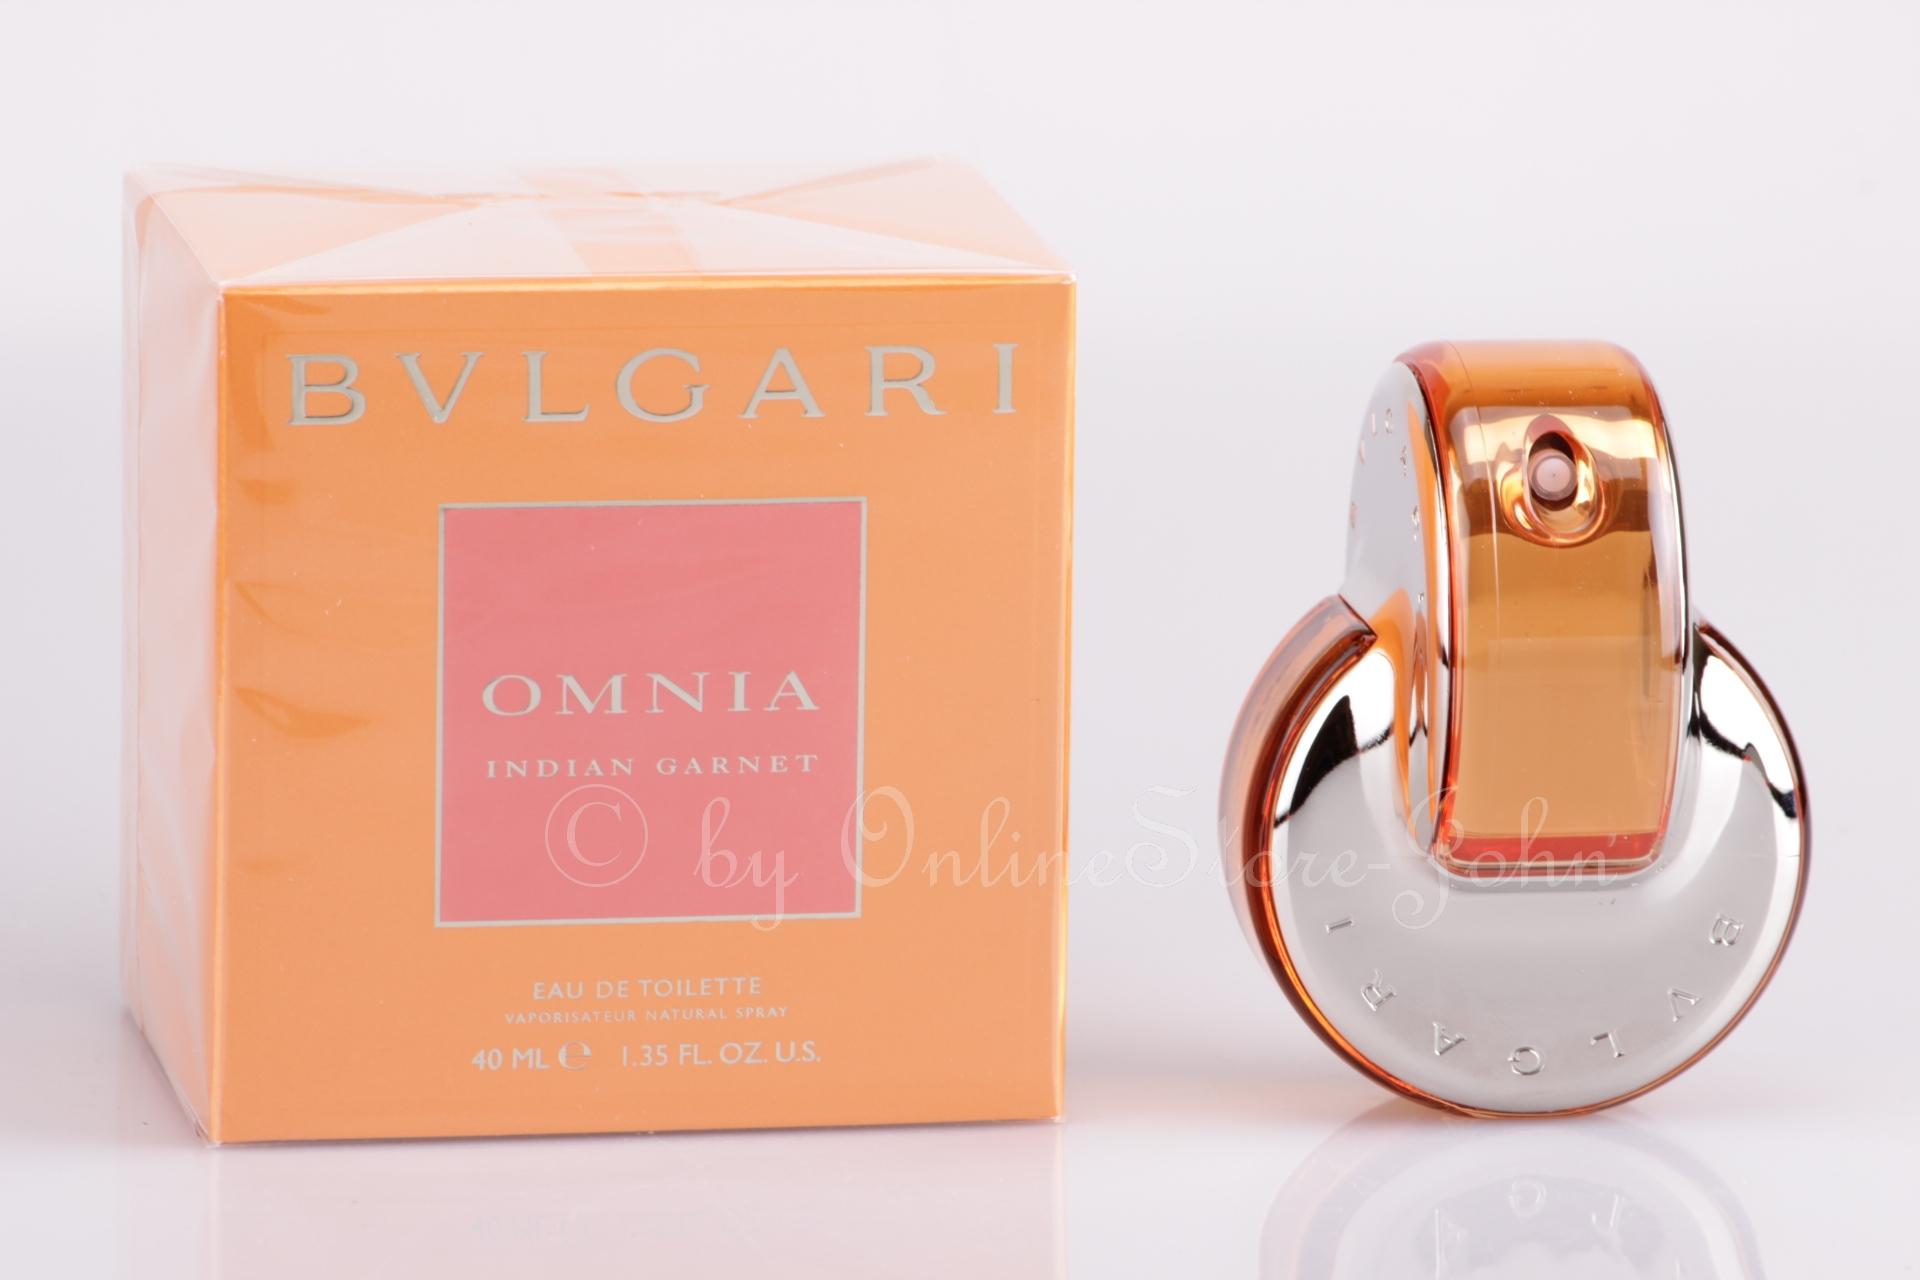 Details zu Bvlgari Omnia Indian Garnet 40ml EDT Eau de Toilette